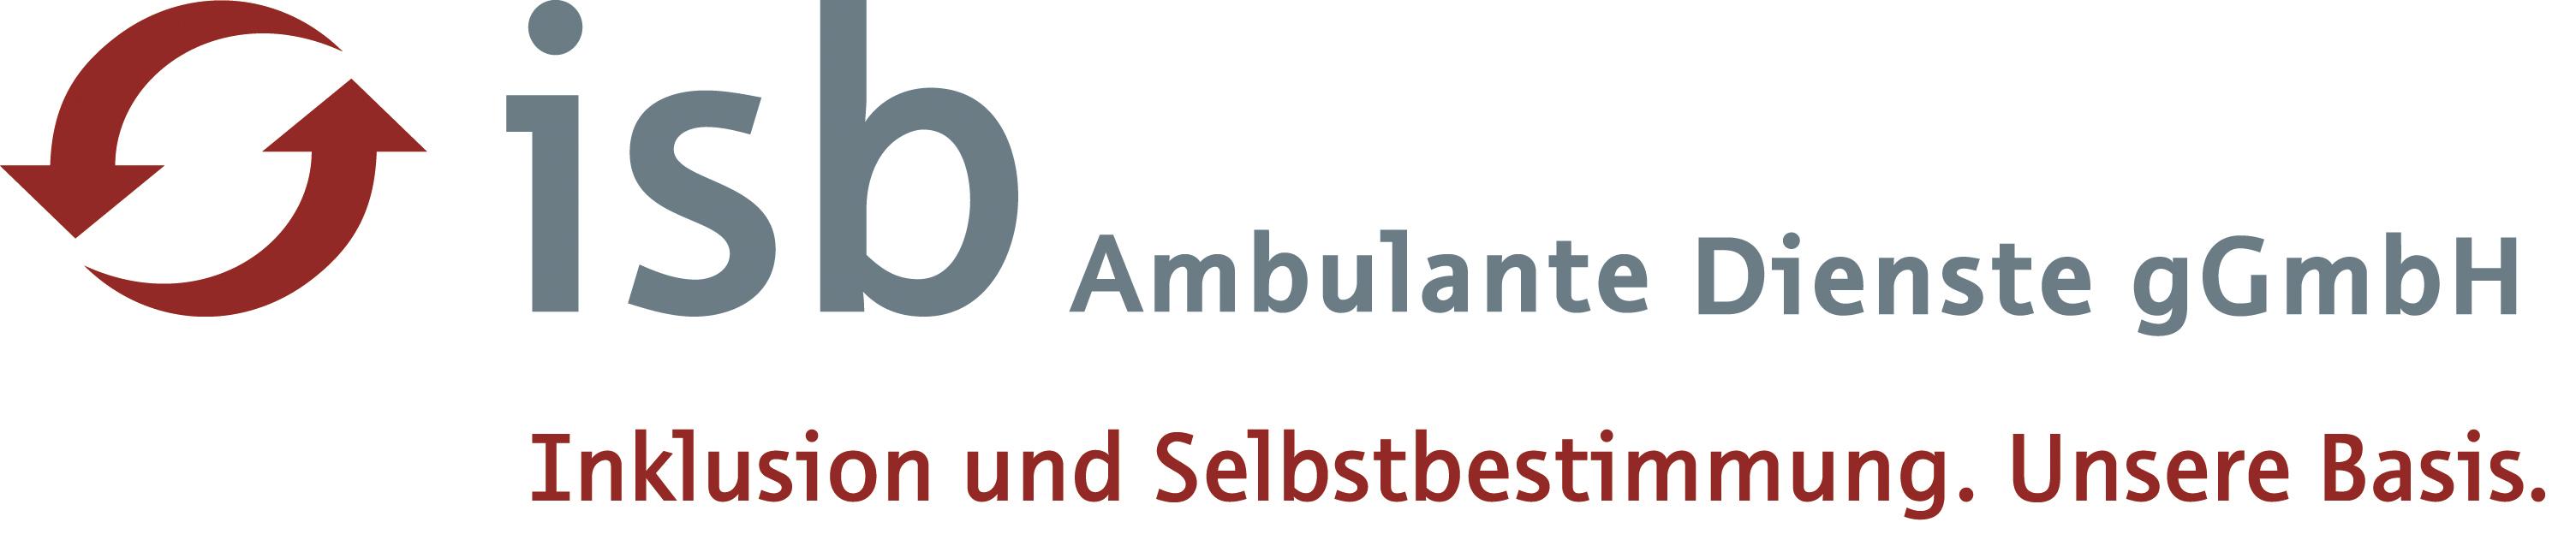 isb Ambulante Dienste gGmbH